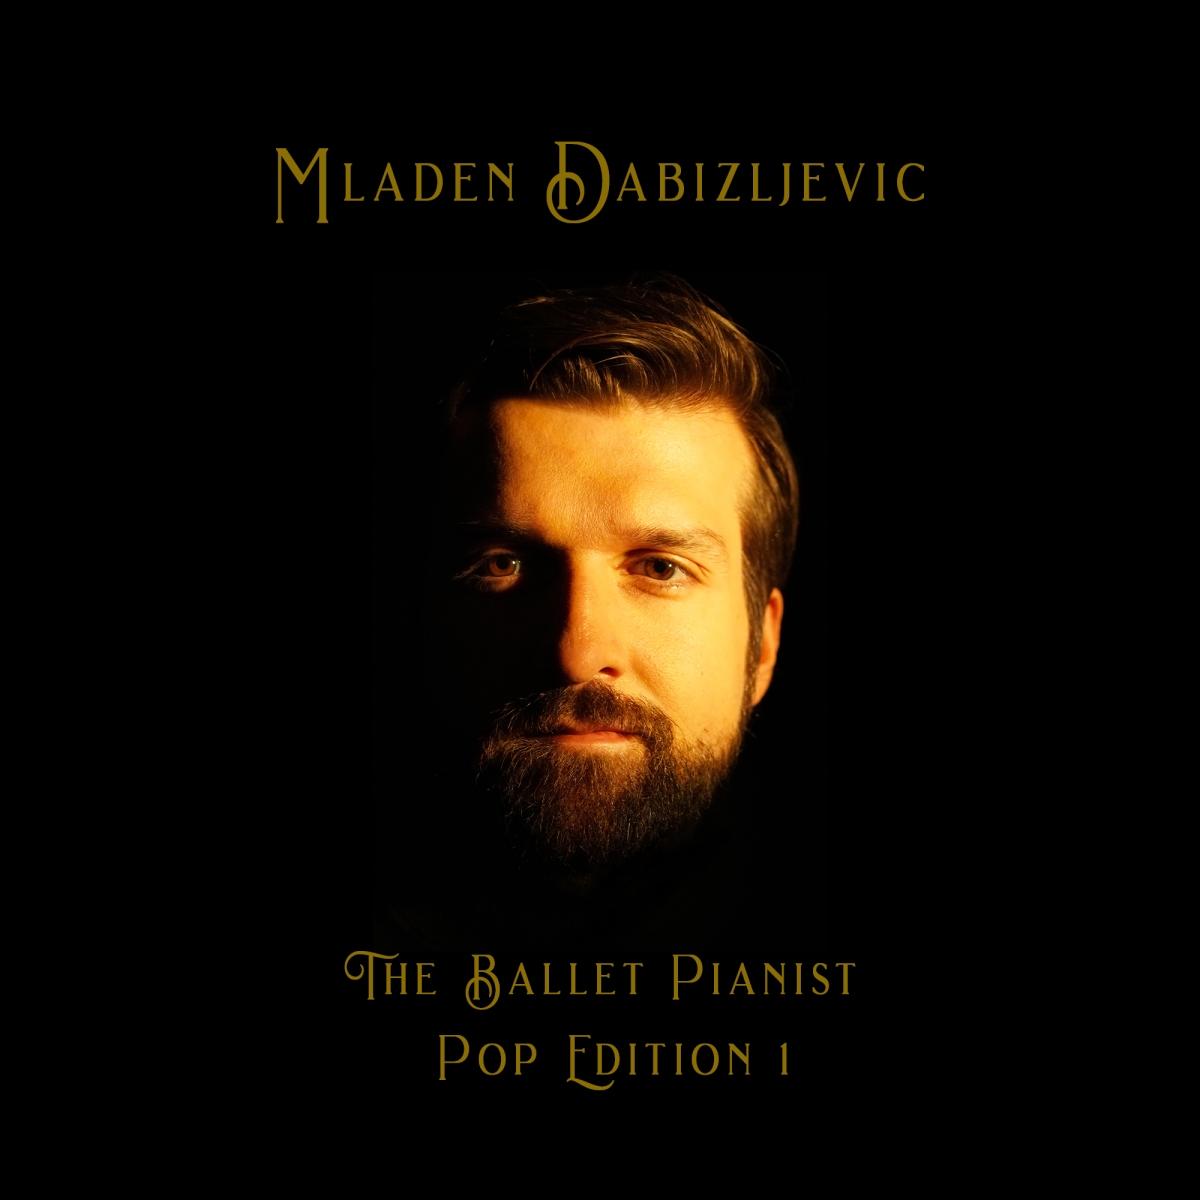 Meet the Ballet Pianist MladenDabizljevic